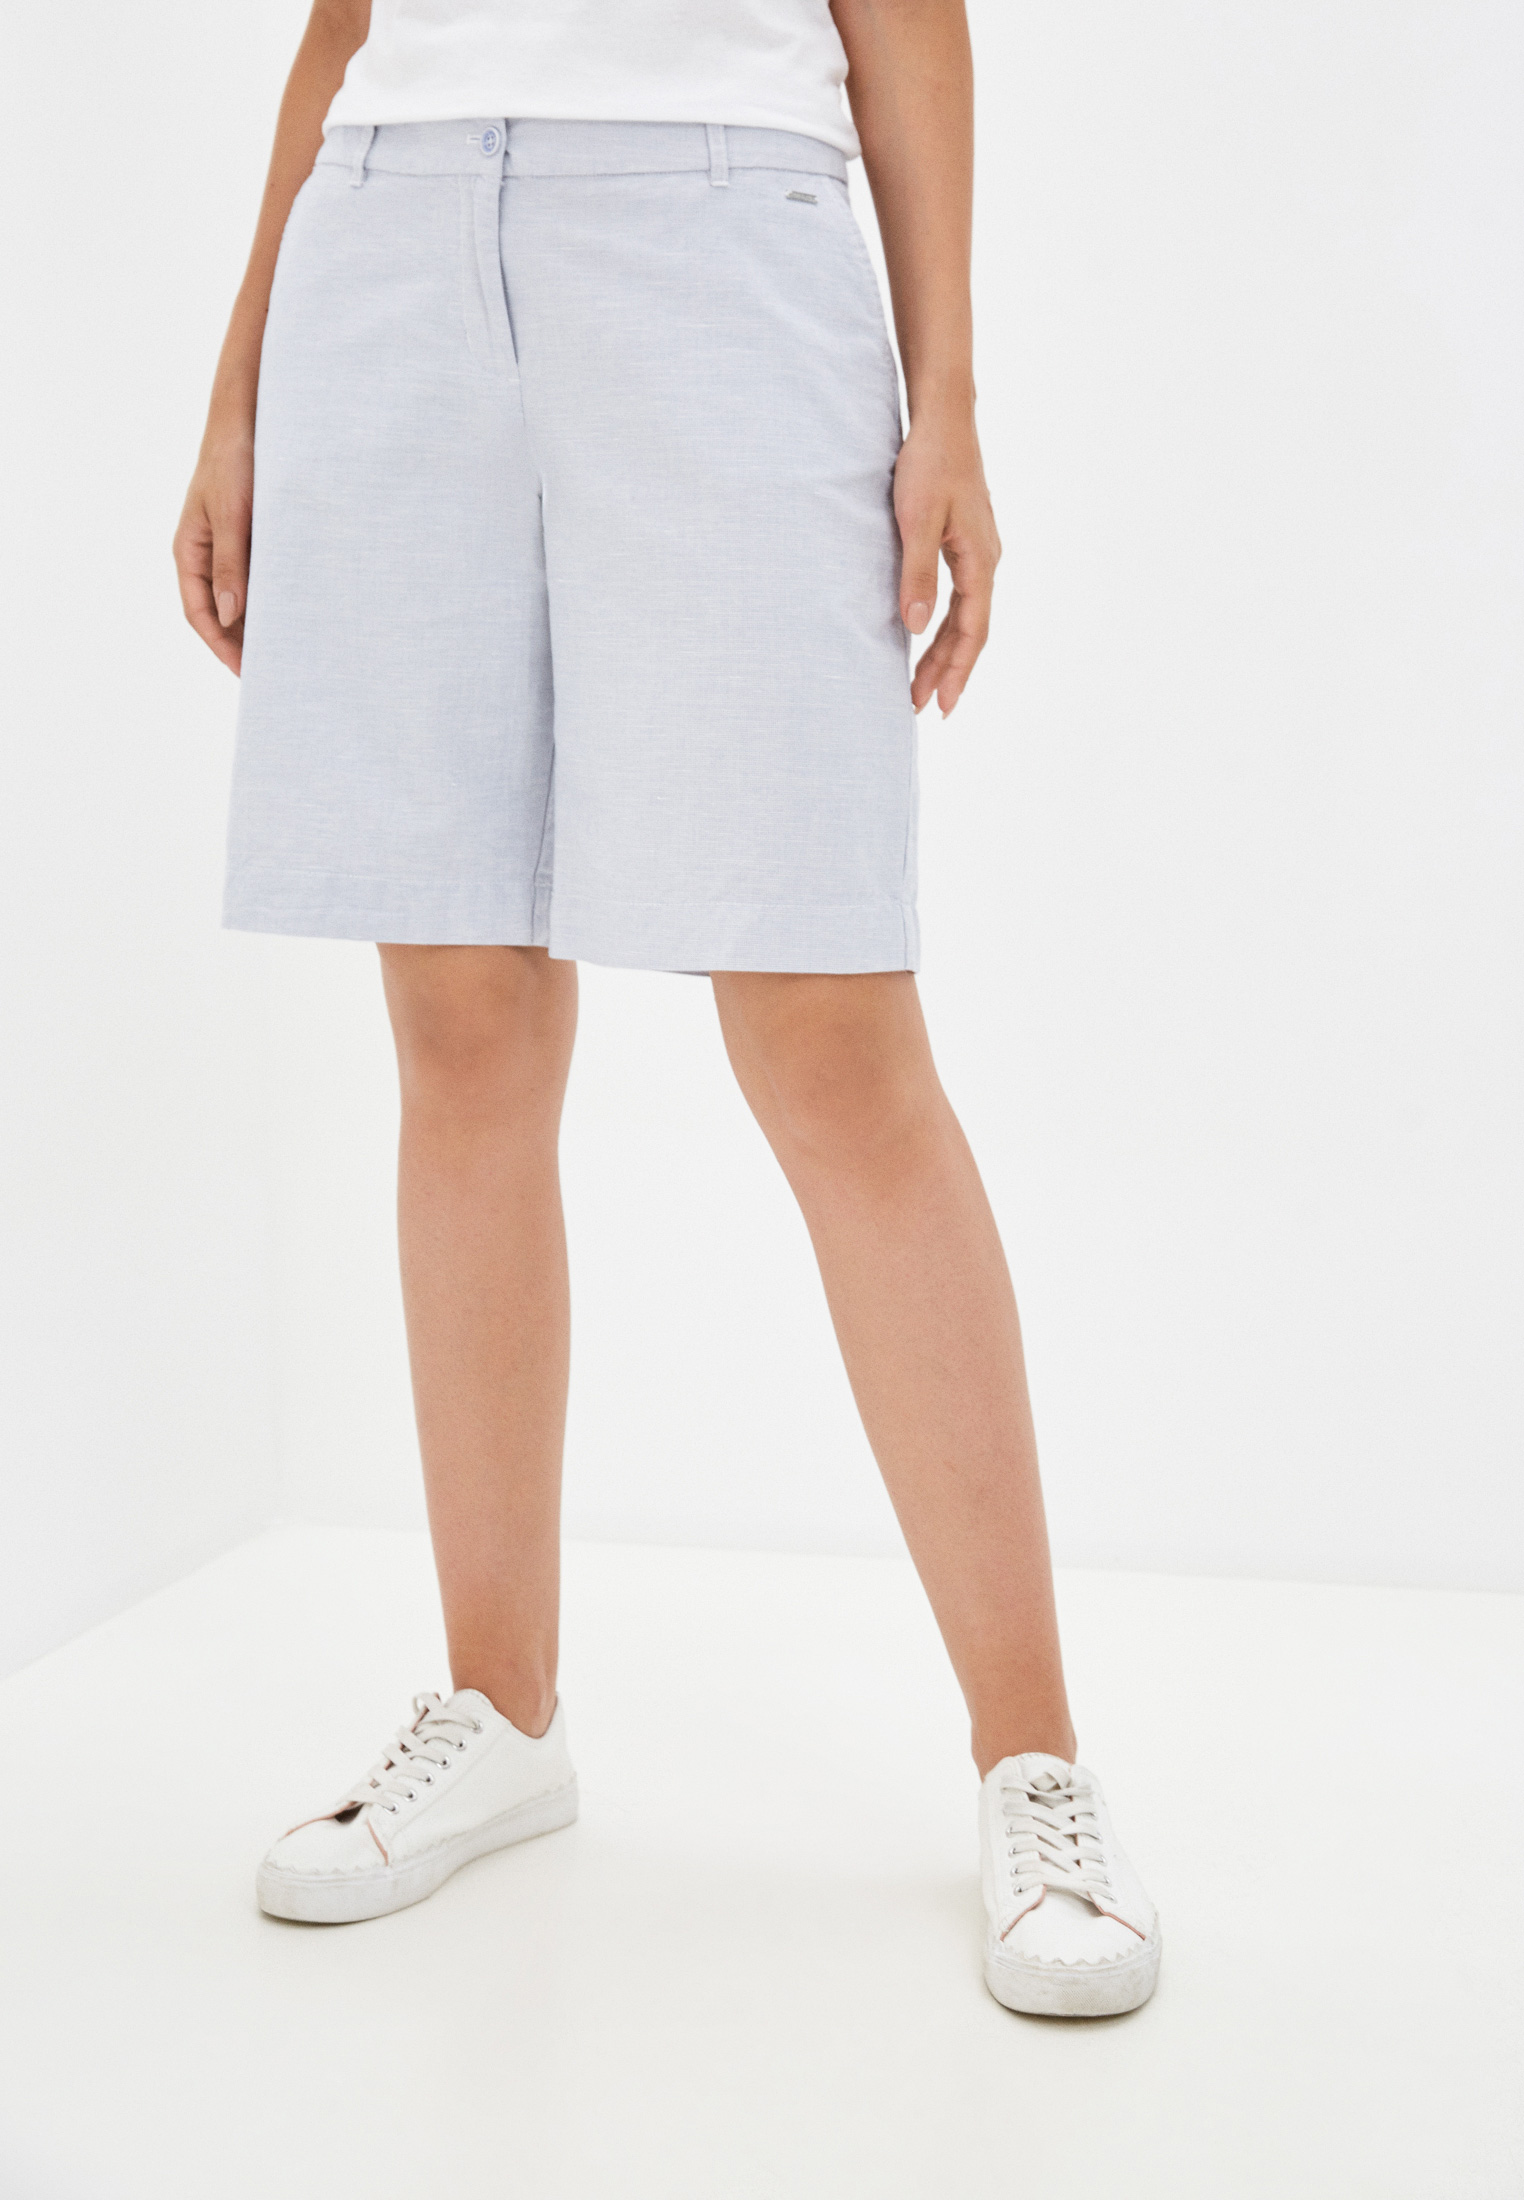 Женские повседневные шорты Finn Flare (Фин Флаер) S19-12043